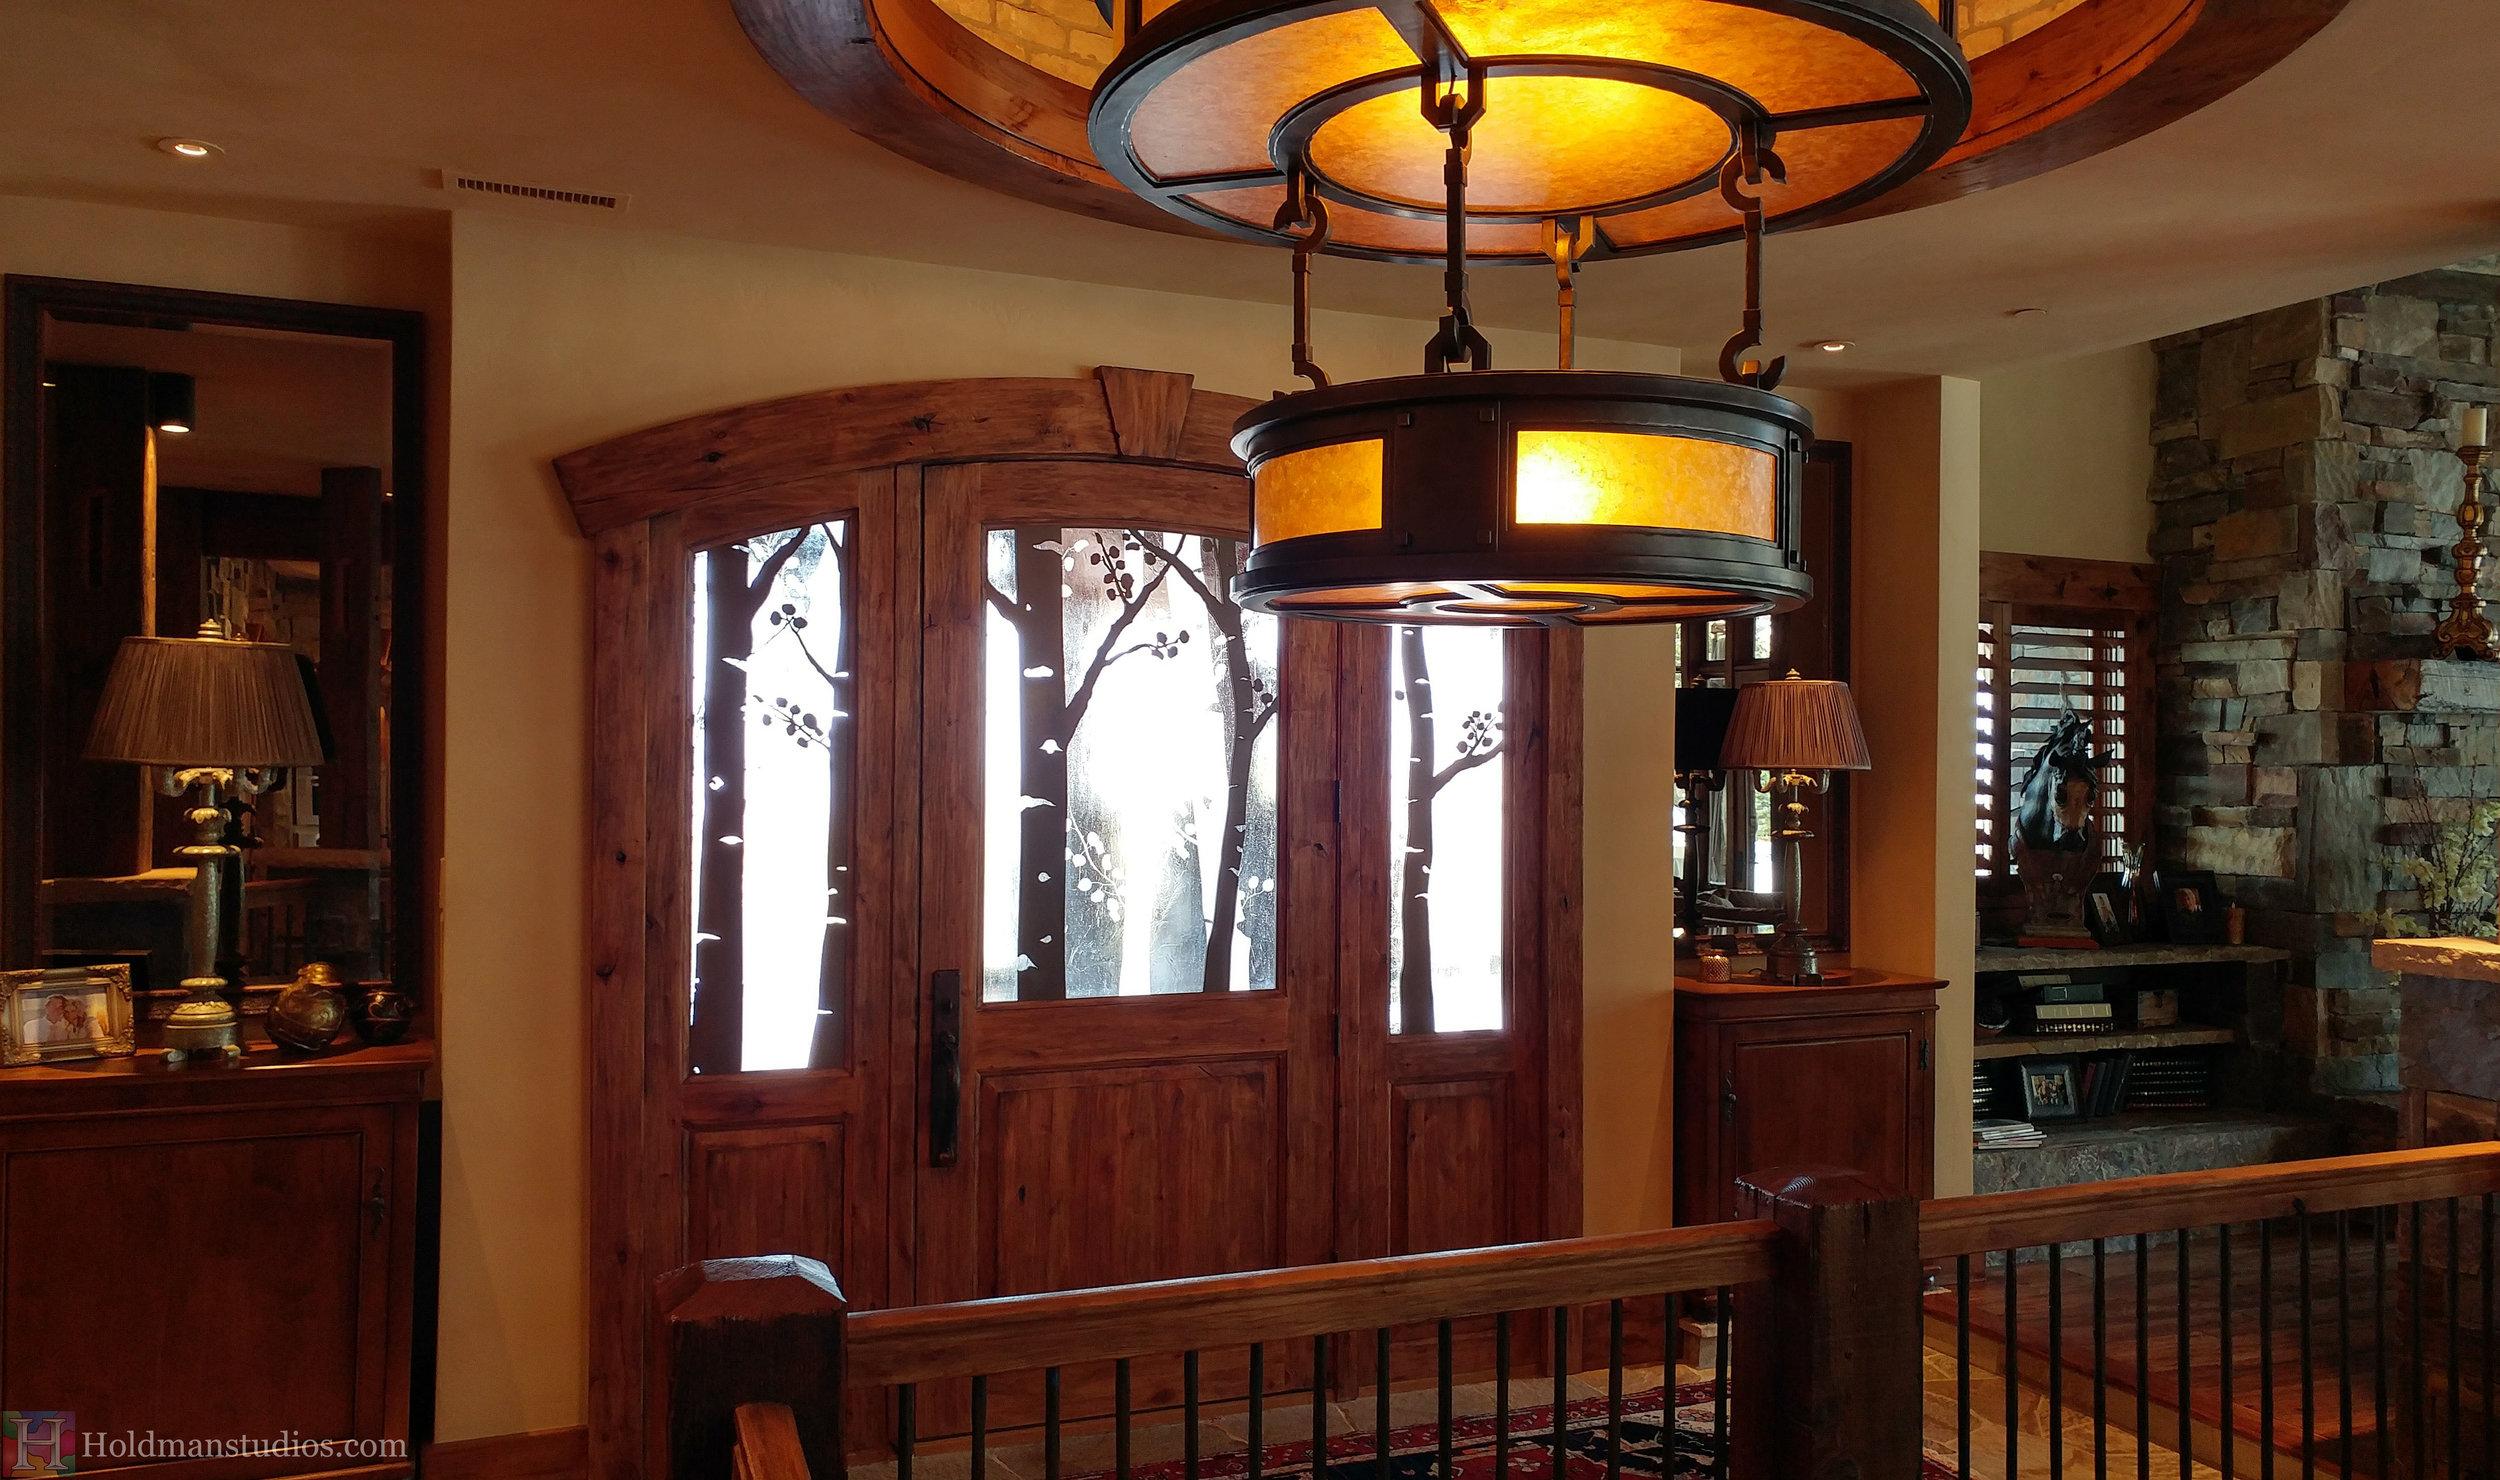 Holdman-studios-etched-art-glass-front-door-windows-aspen-trees-leaves-inside.jpg